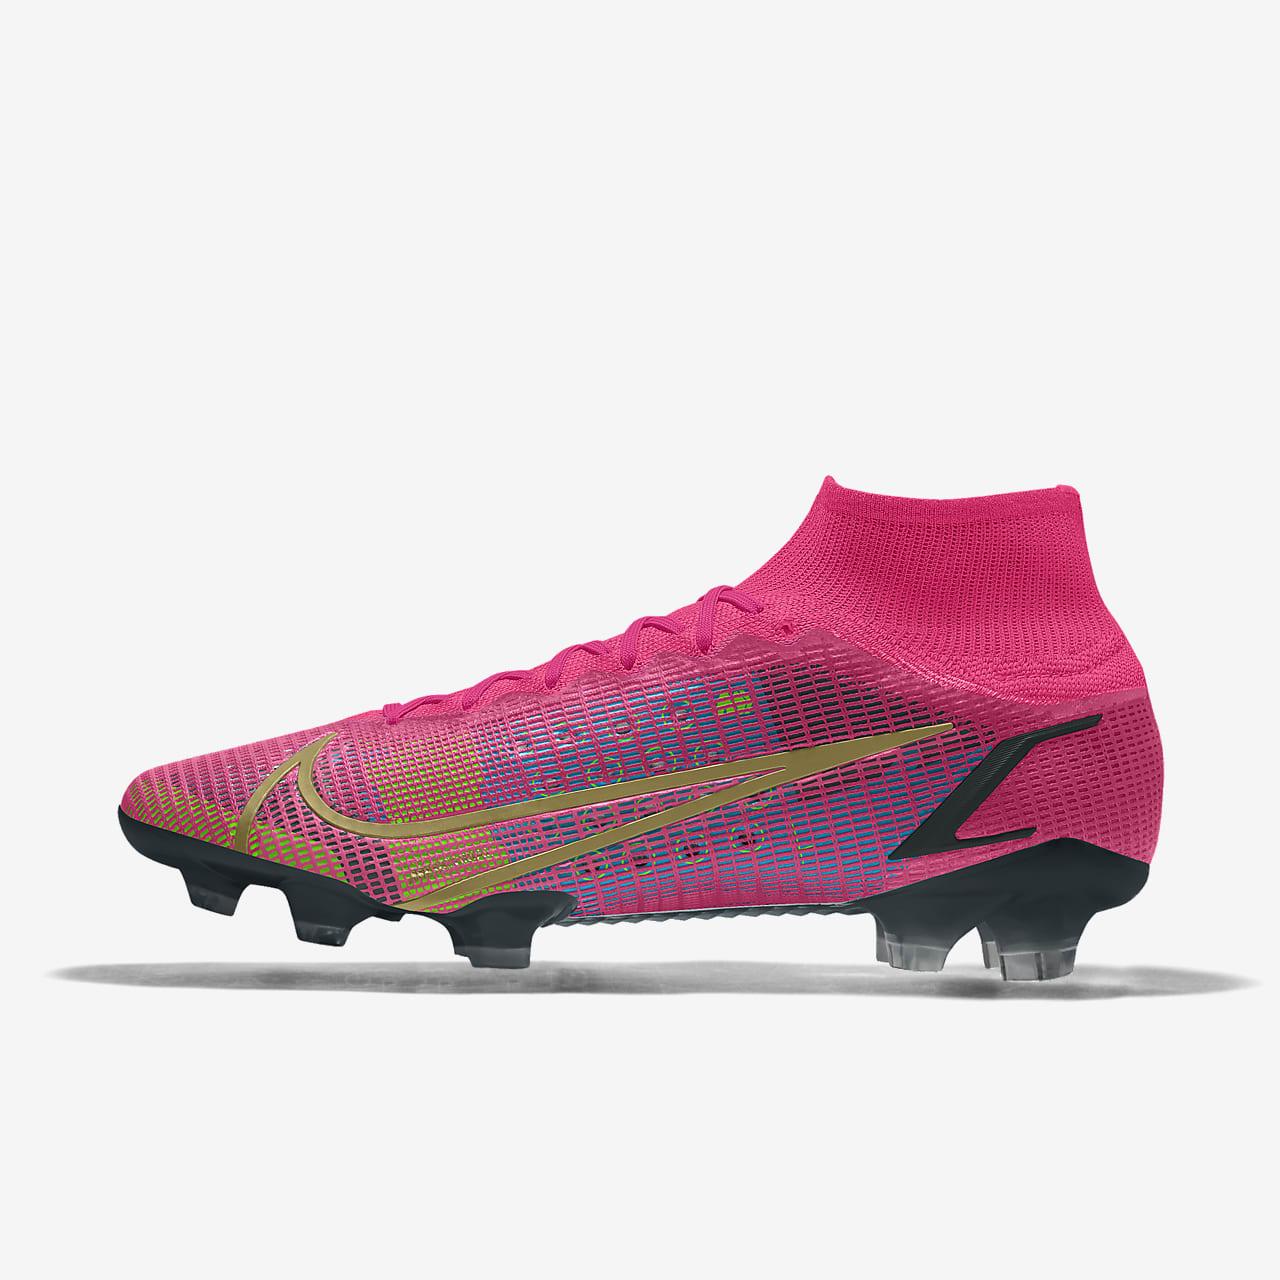 Nike Mercurial Superfly 8 Elite By You Custom Soccer Cleat